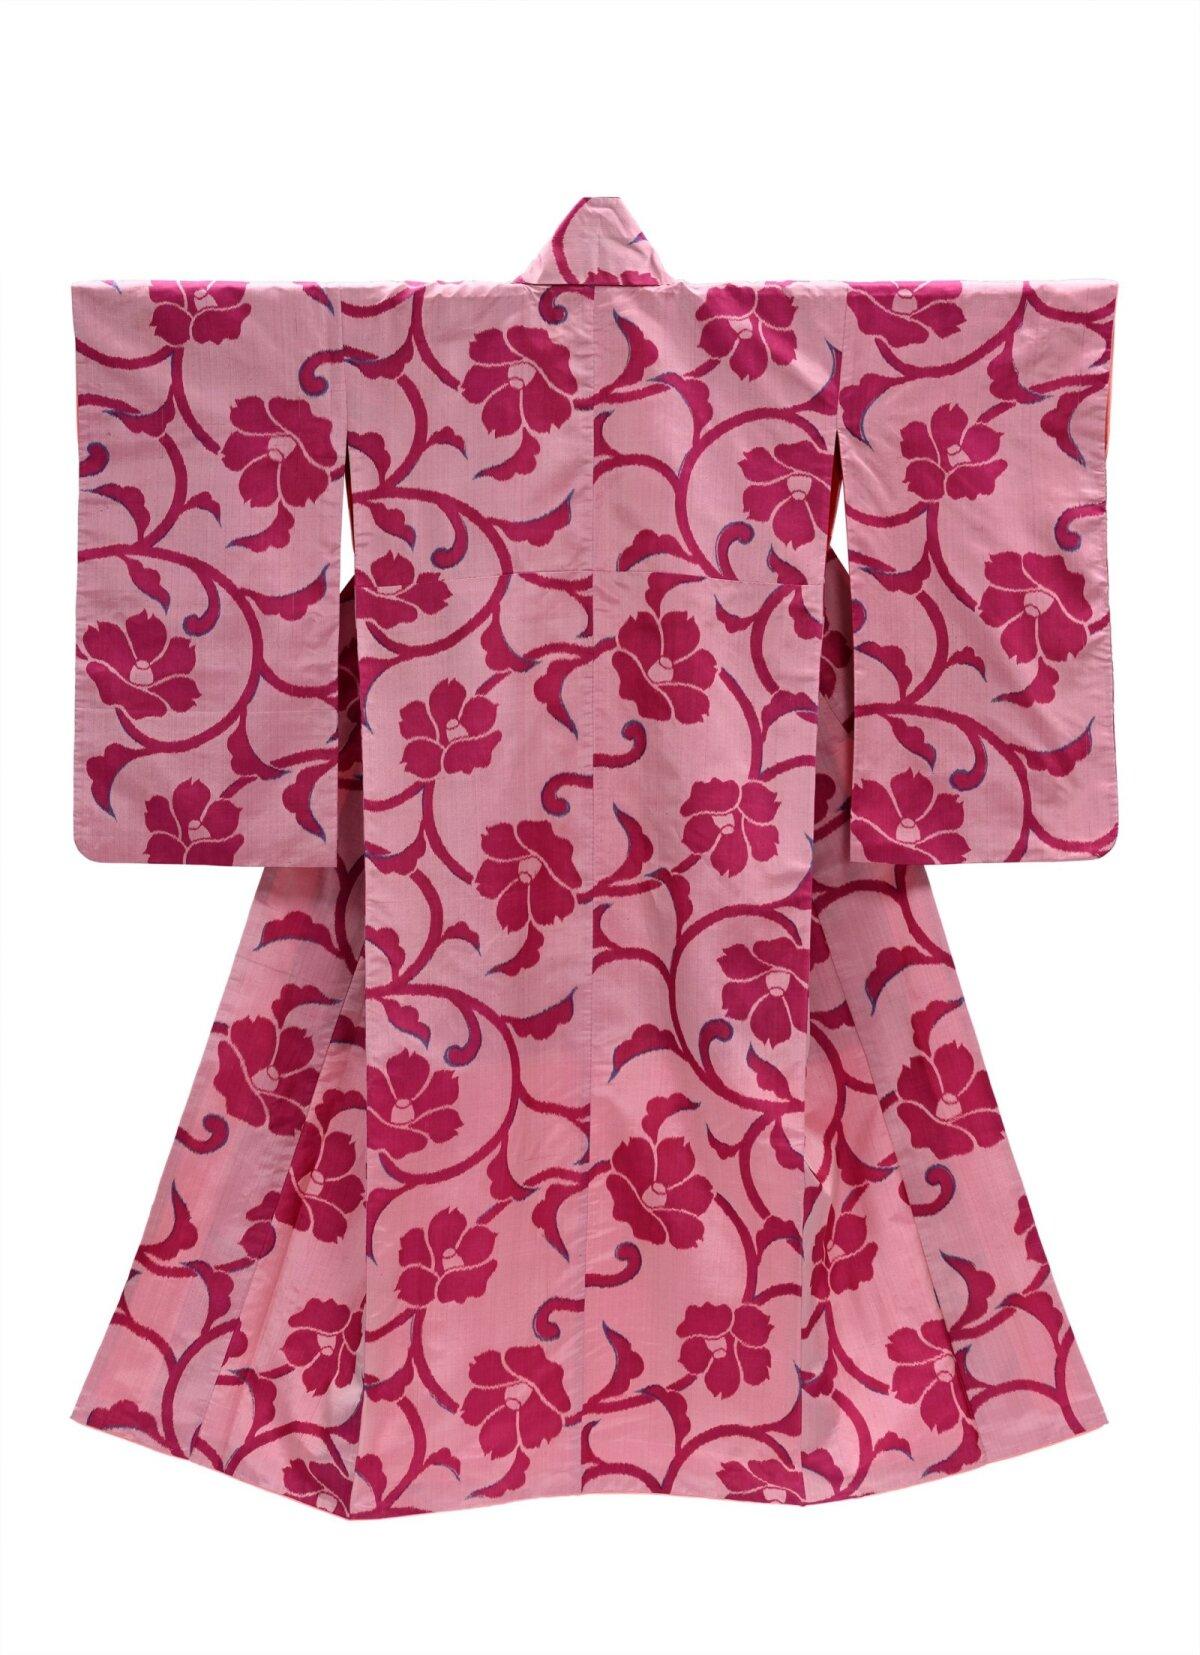 Jaapani kimono.